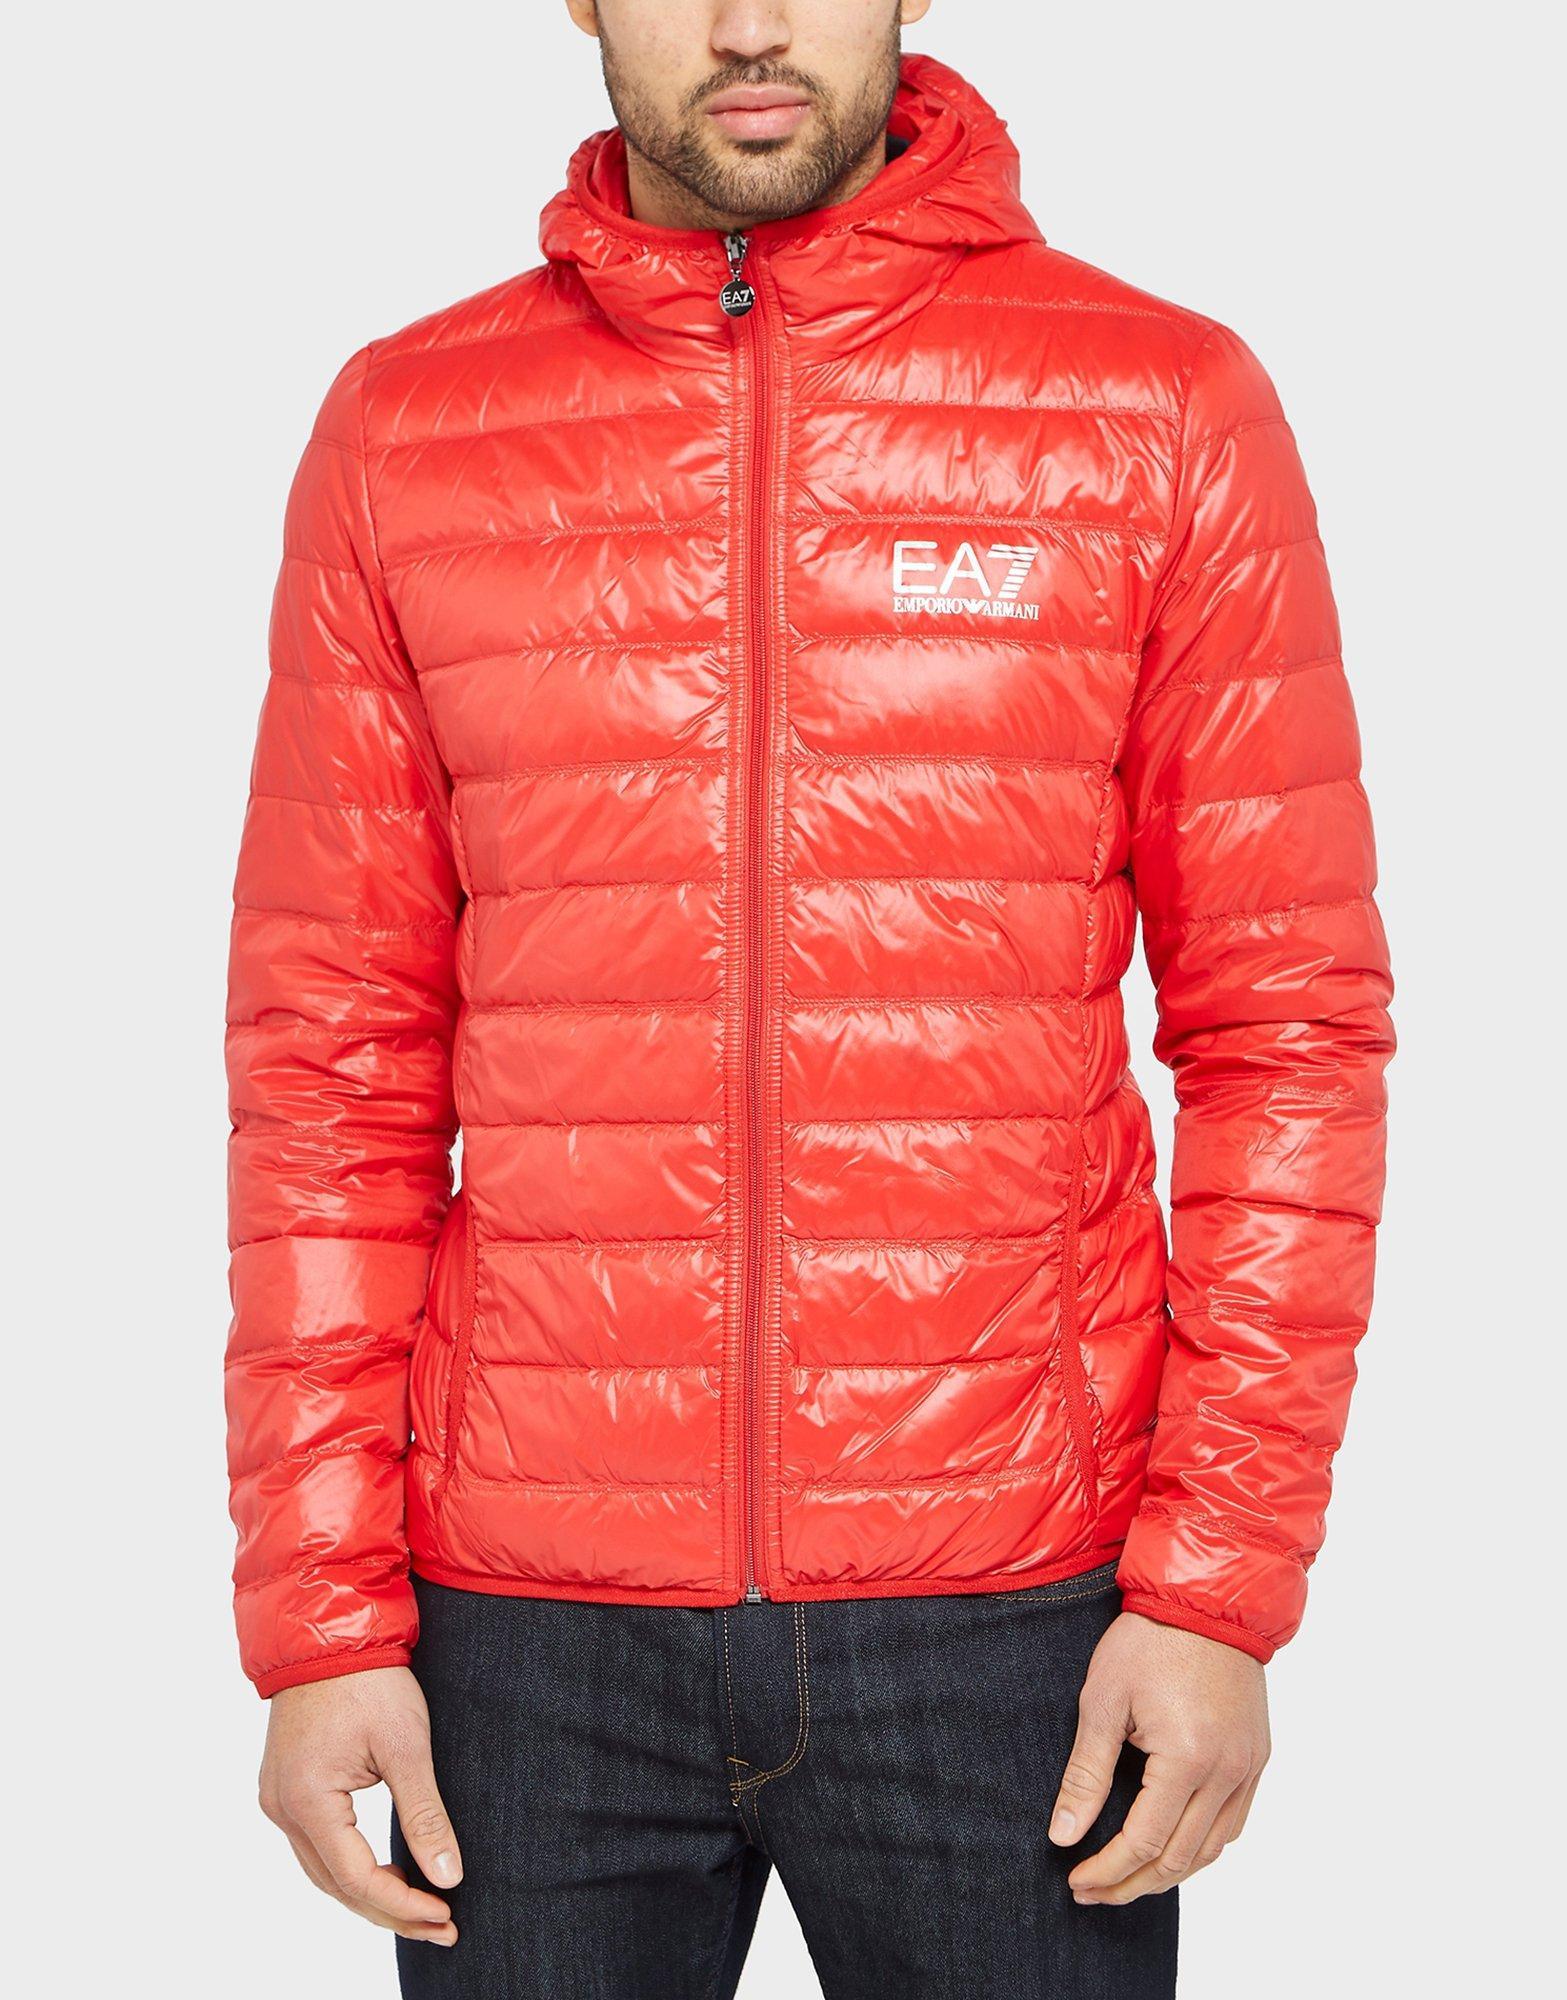 Red and black armani coat